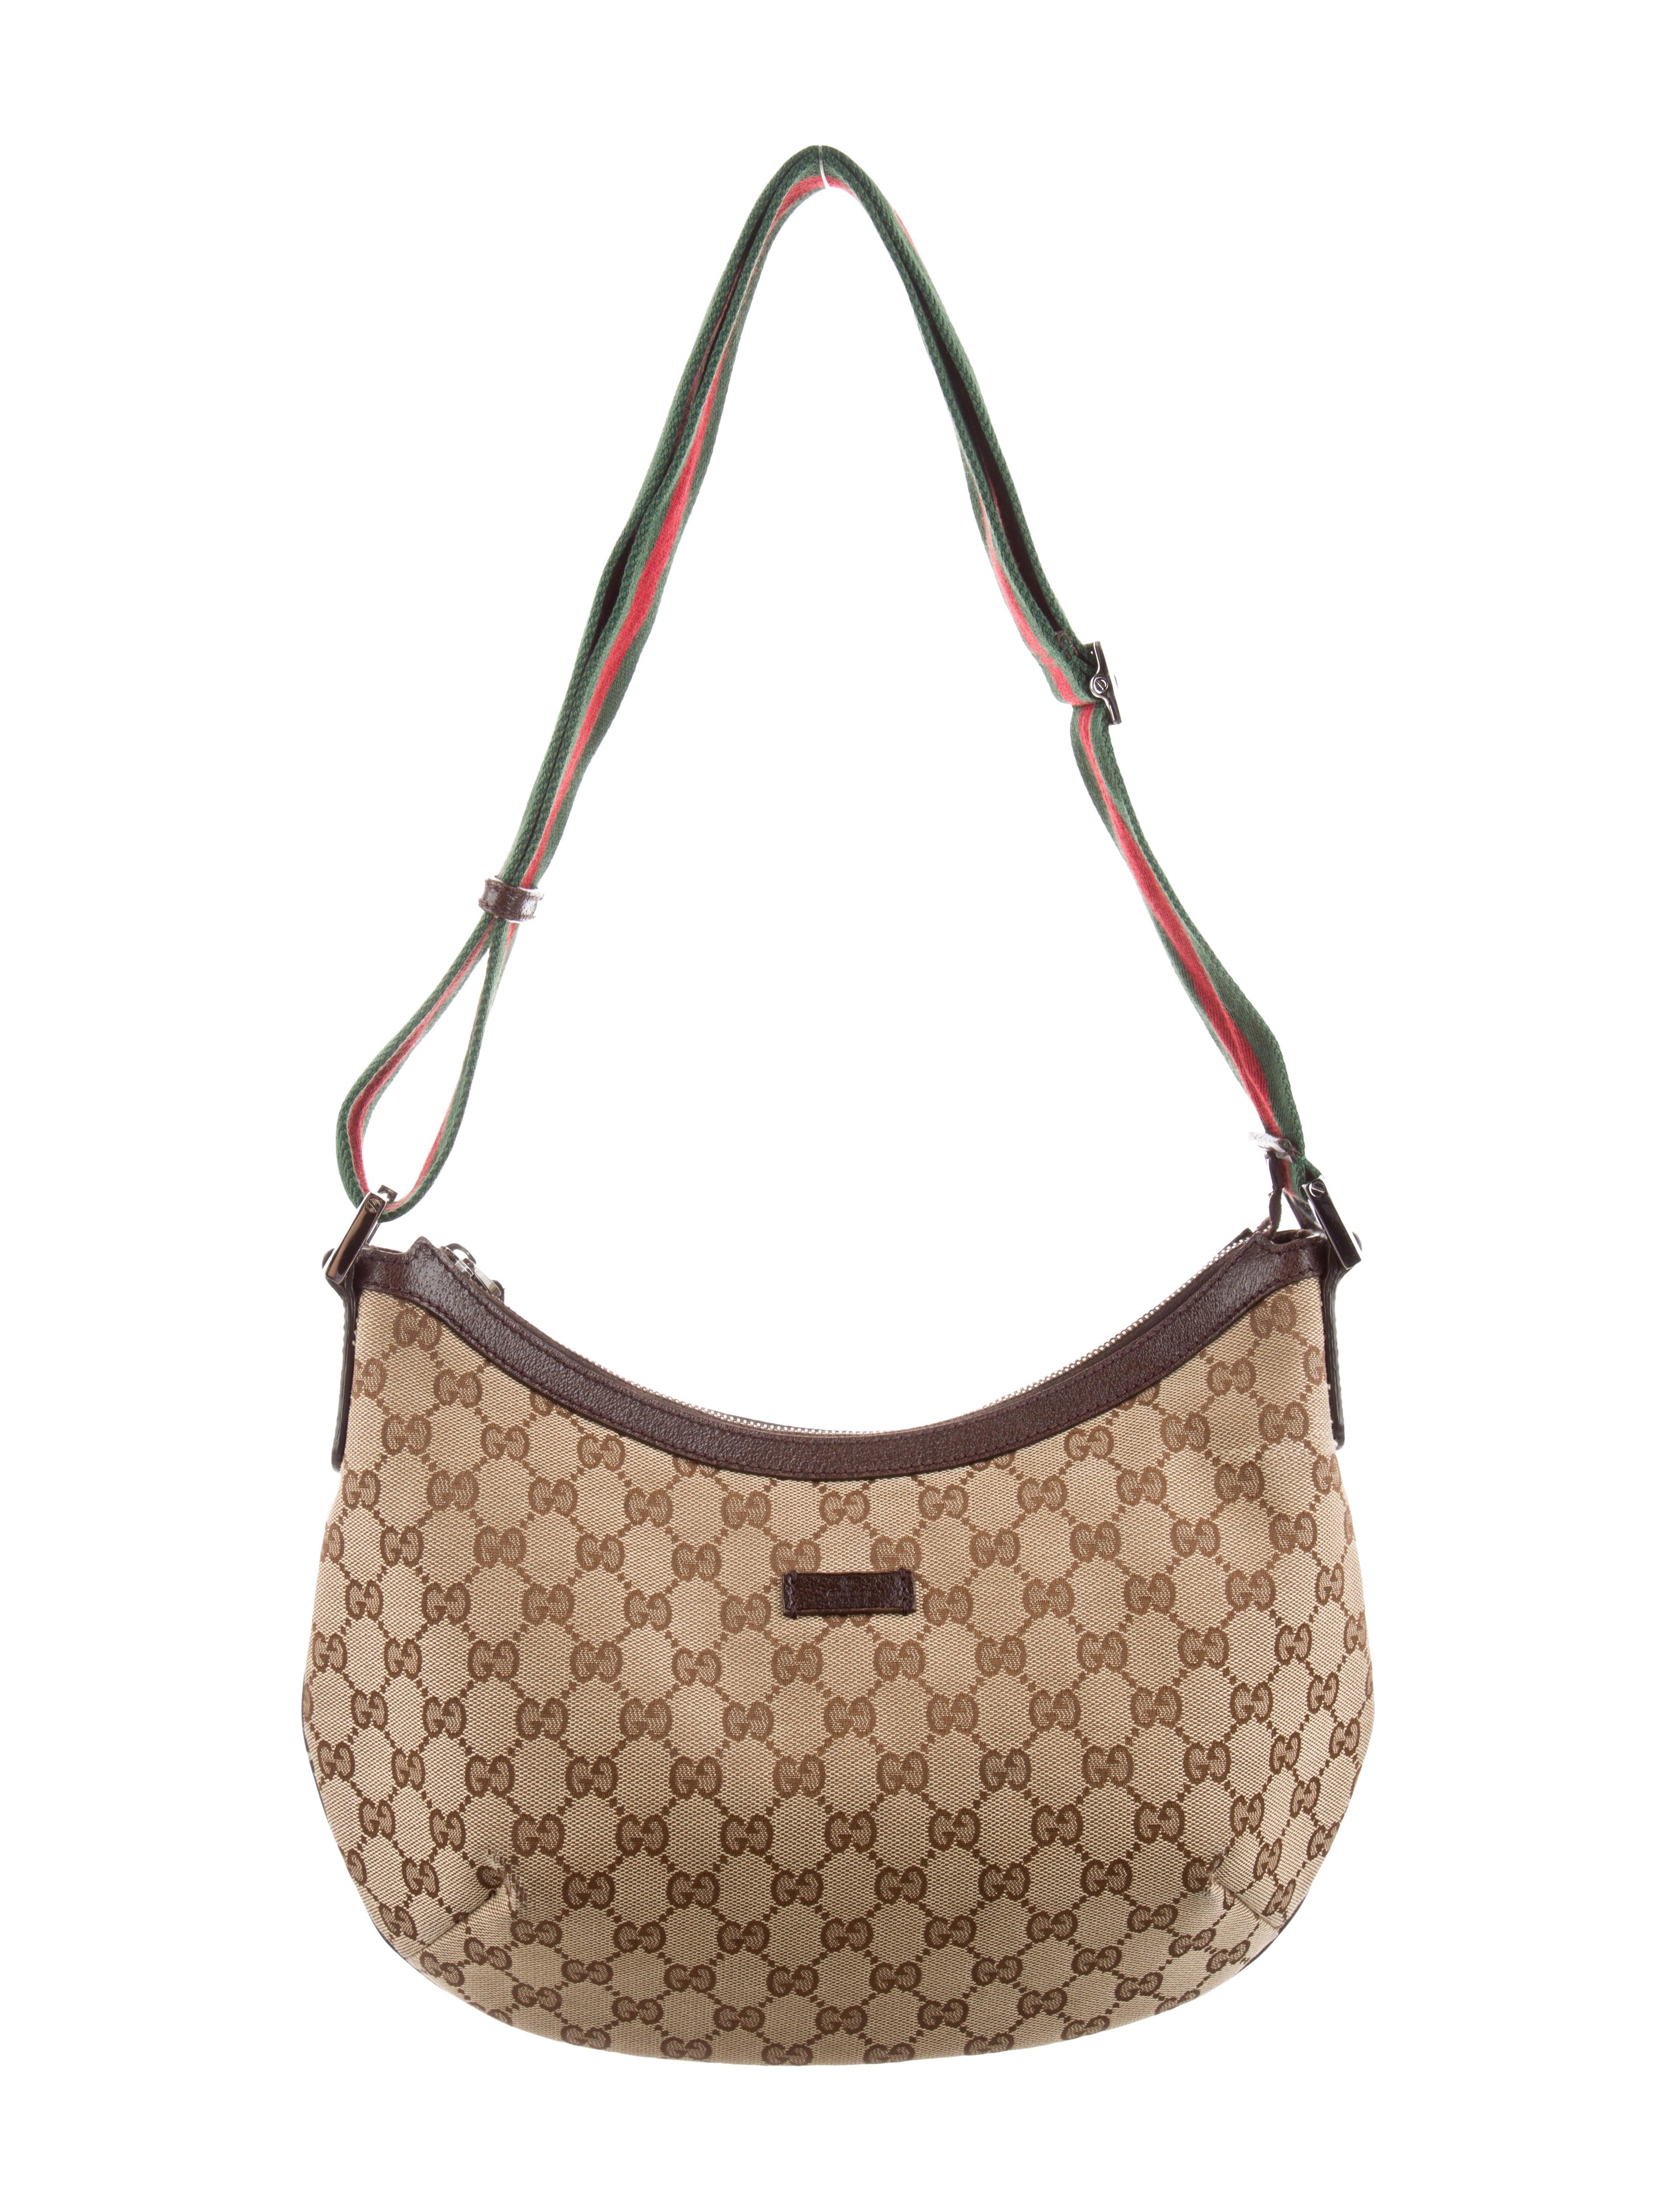 189d97450a6 Gucci Original GG Dipped Canvas Messenger Bag - Handbags - GUC263402 ...